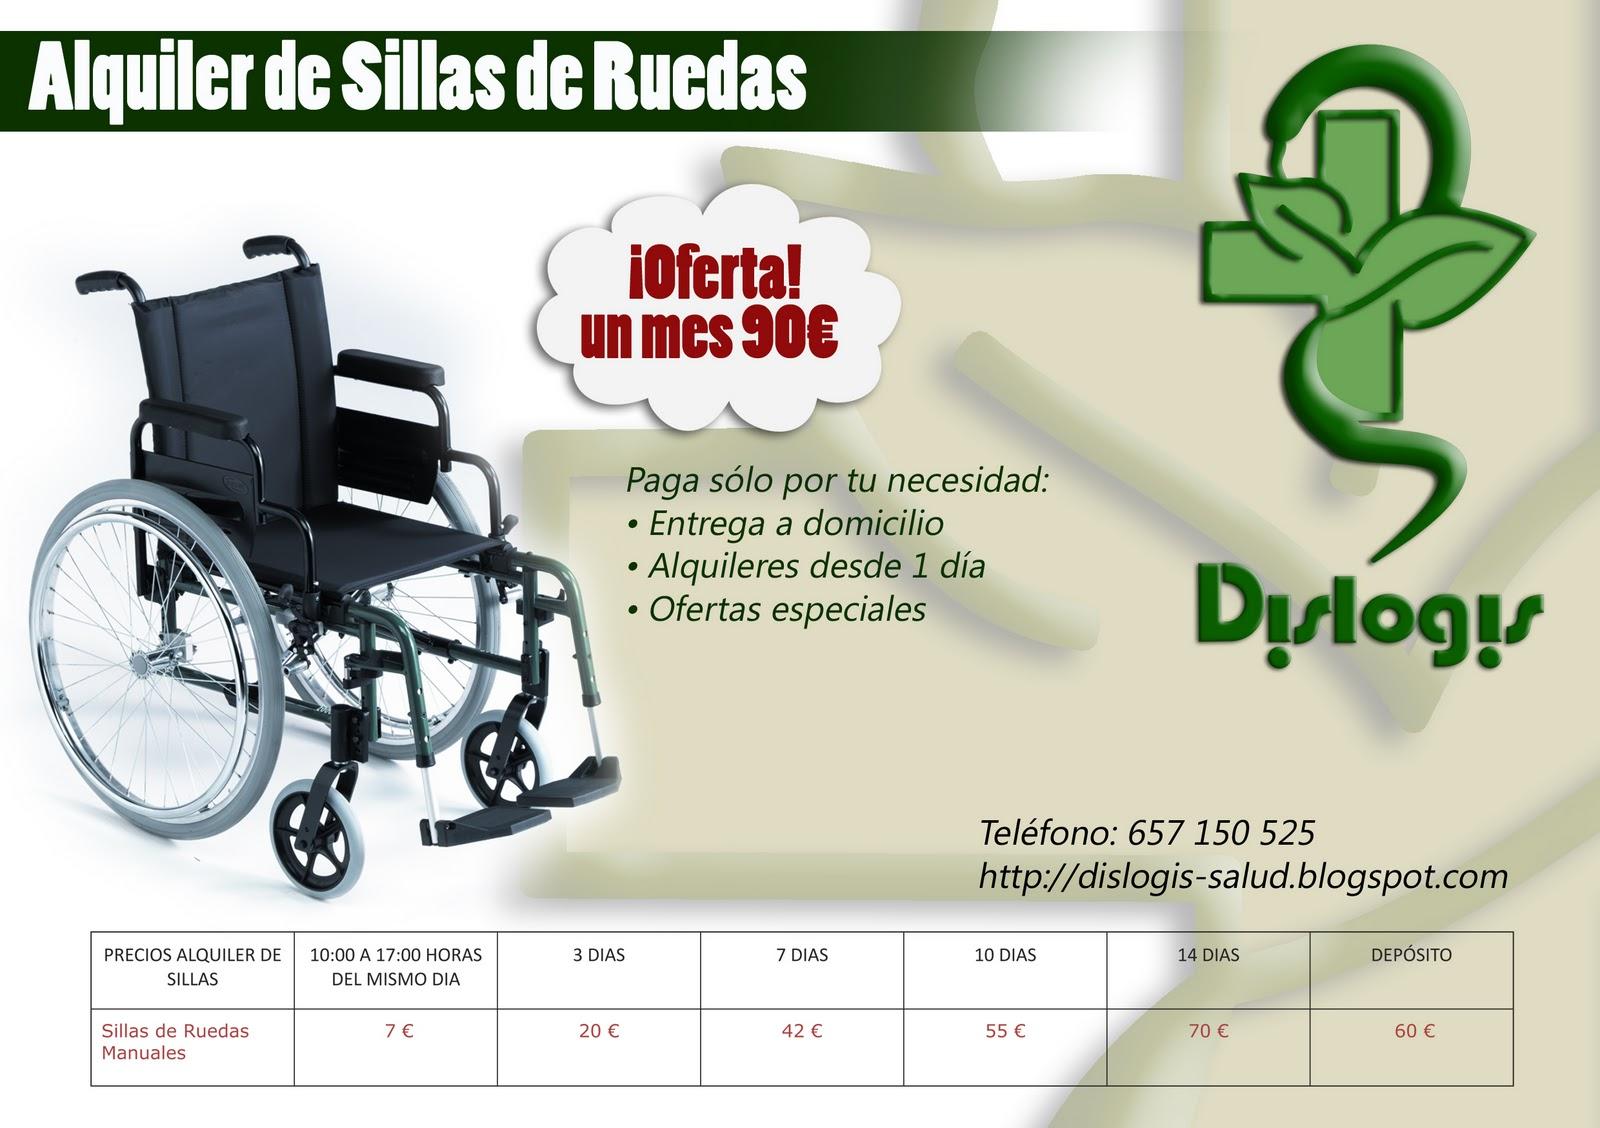 Dislogis ayudamos a tu salud alquiler de sillas de ruedas - Alquiler de sillas de ruedas en valencia ...